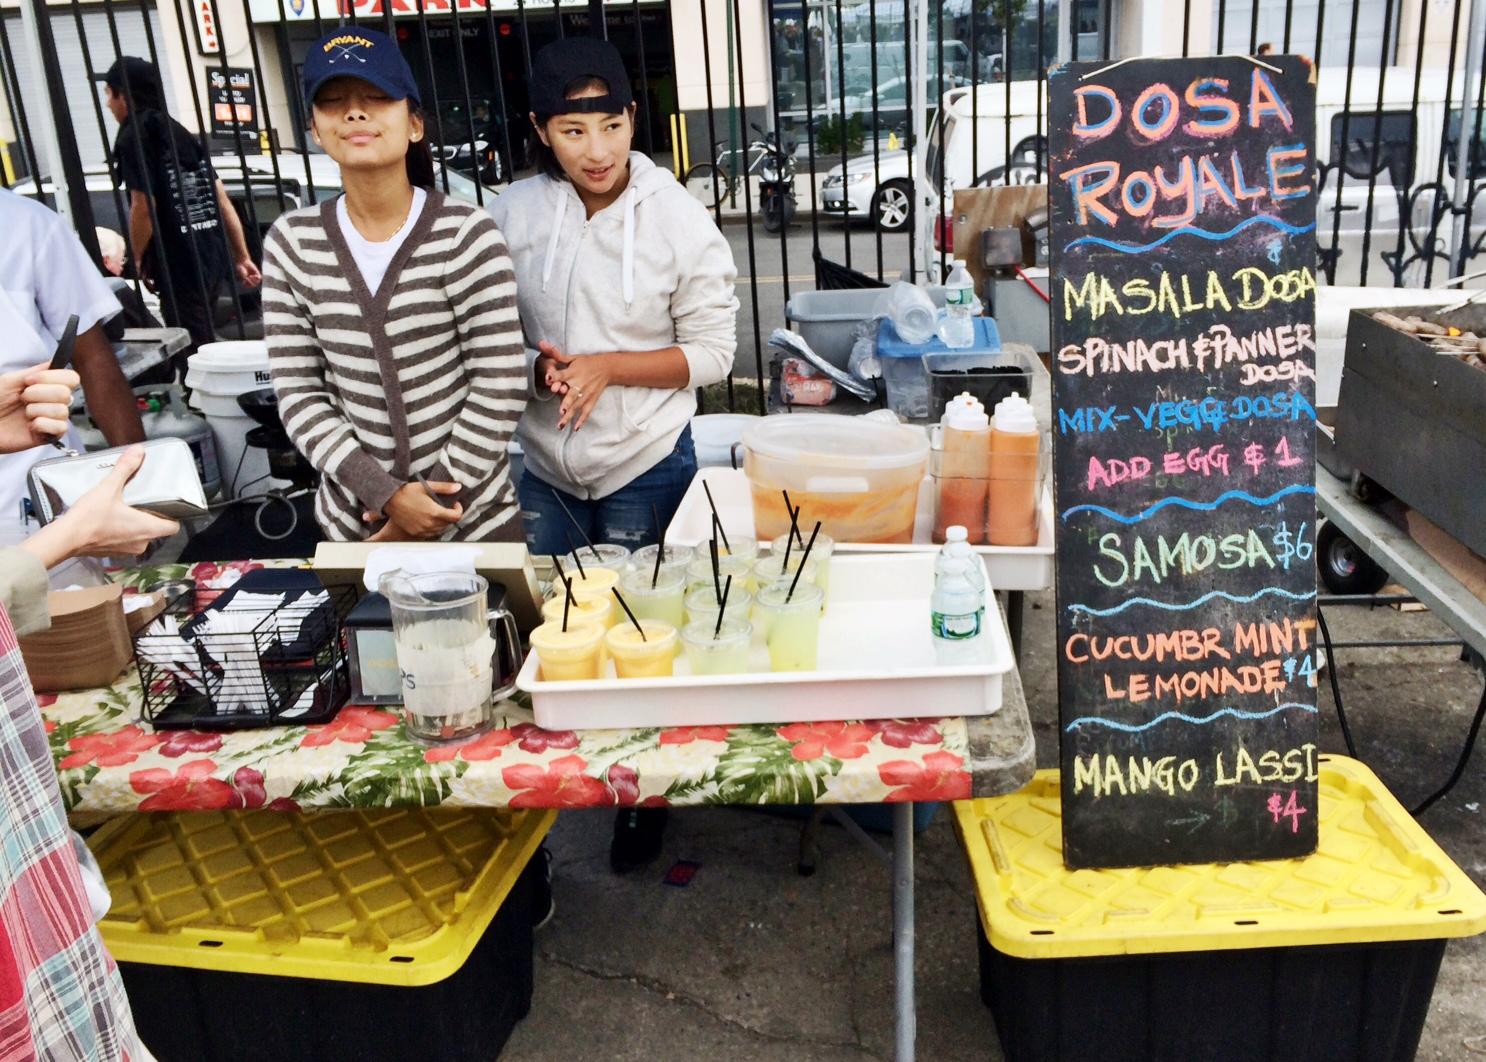 Eetmarkt Smorasburg in NYC